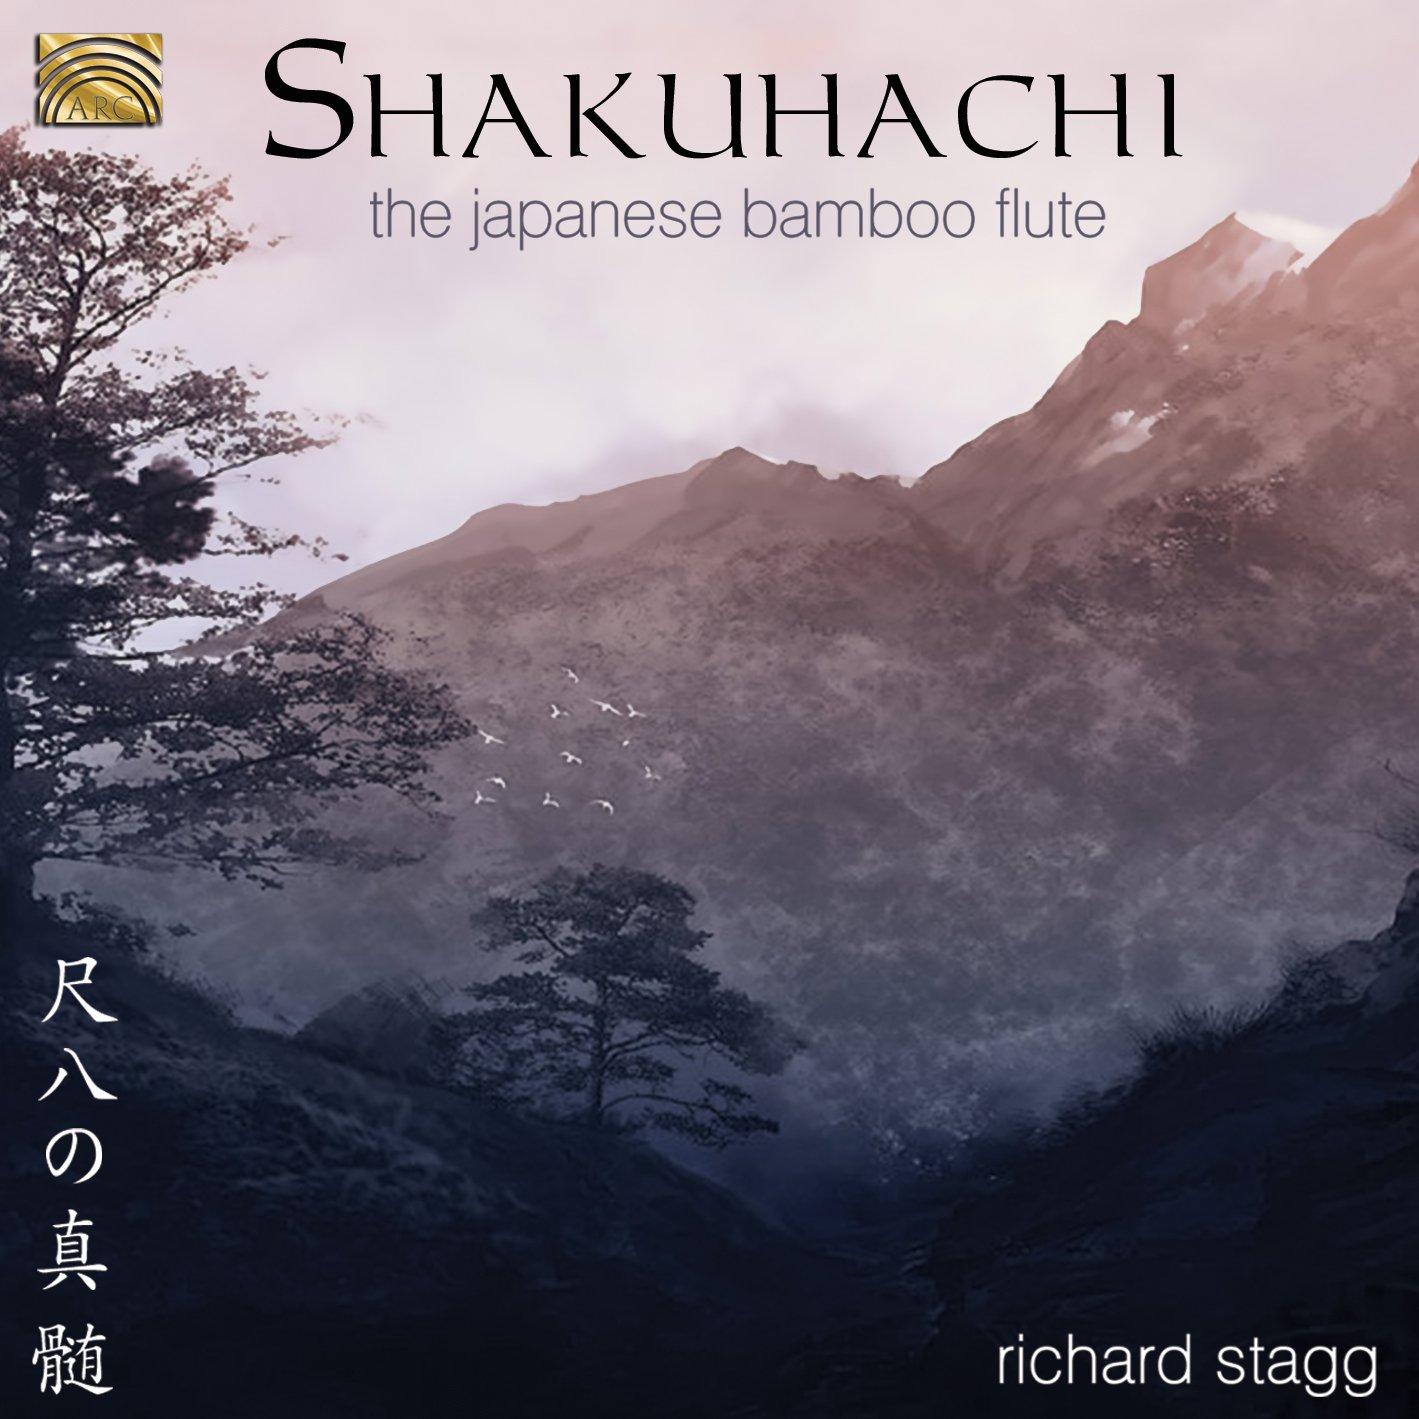 https://www.amazon.co.uk/Shakuhachi-Japanese-Bamboo-Richard-Stagg/dp/B00NJ2ZDNU/ref=sr_1_7?ie=UTF8&qid=1485276910&sr=8-7&keywords=shakuhachi